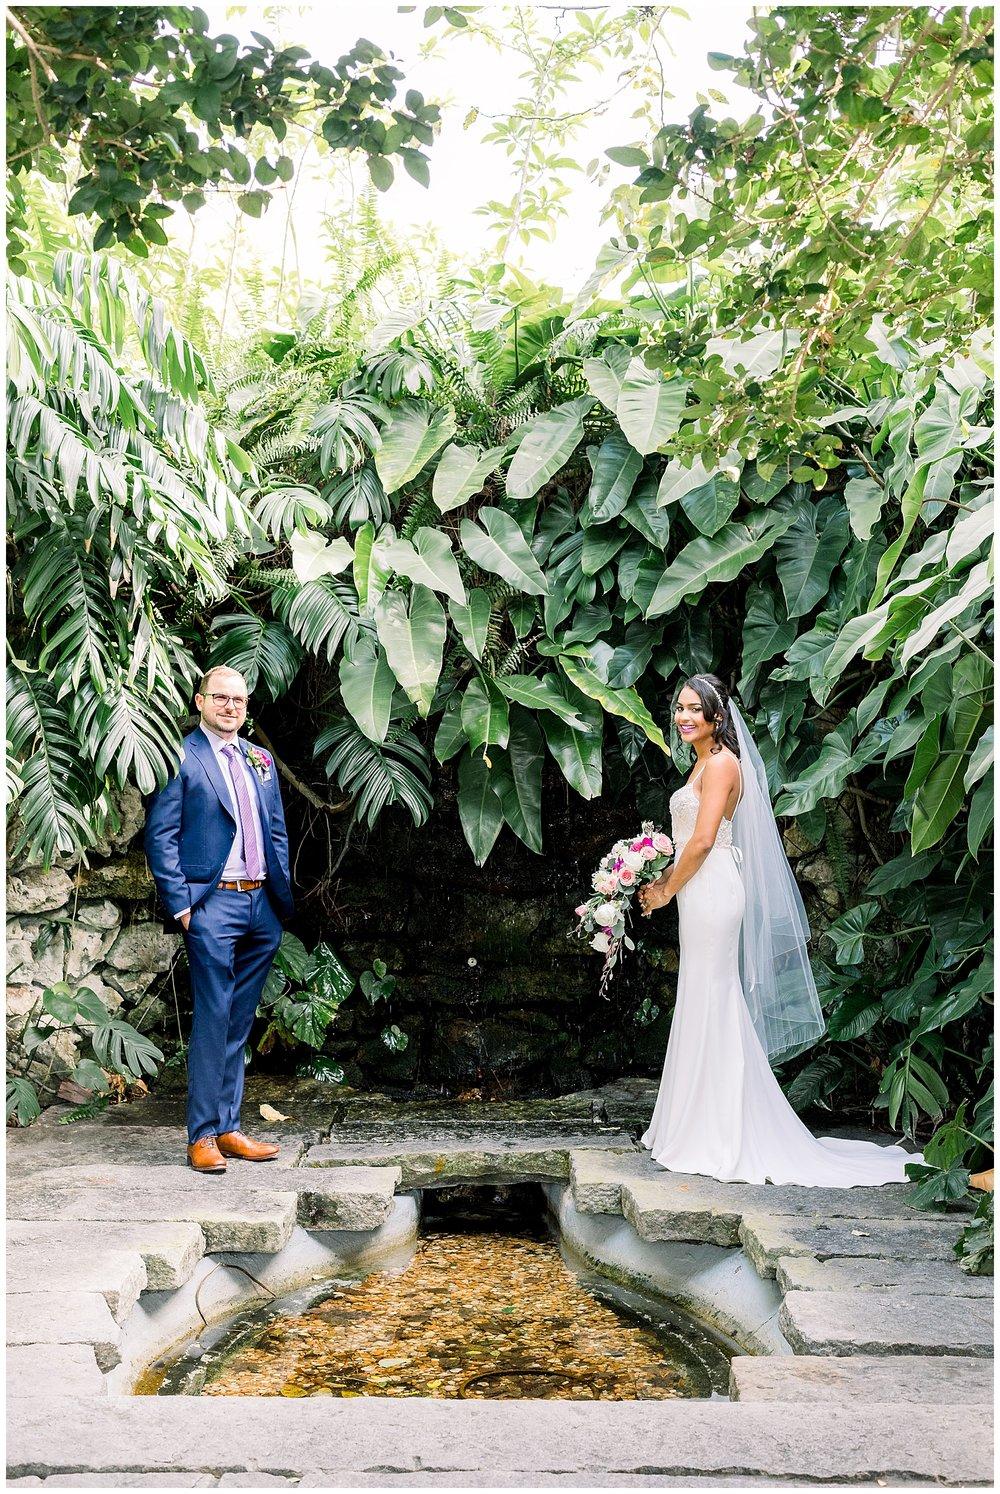 jessicafredericks_lakeland_tampa_wedding_purple_crazy hour_0034.jpg